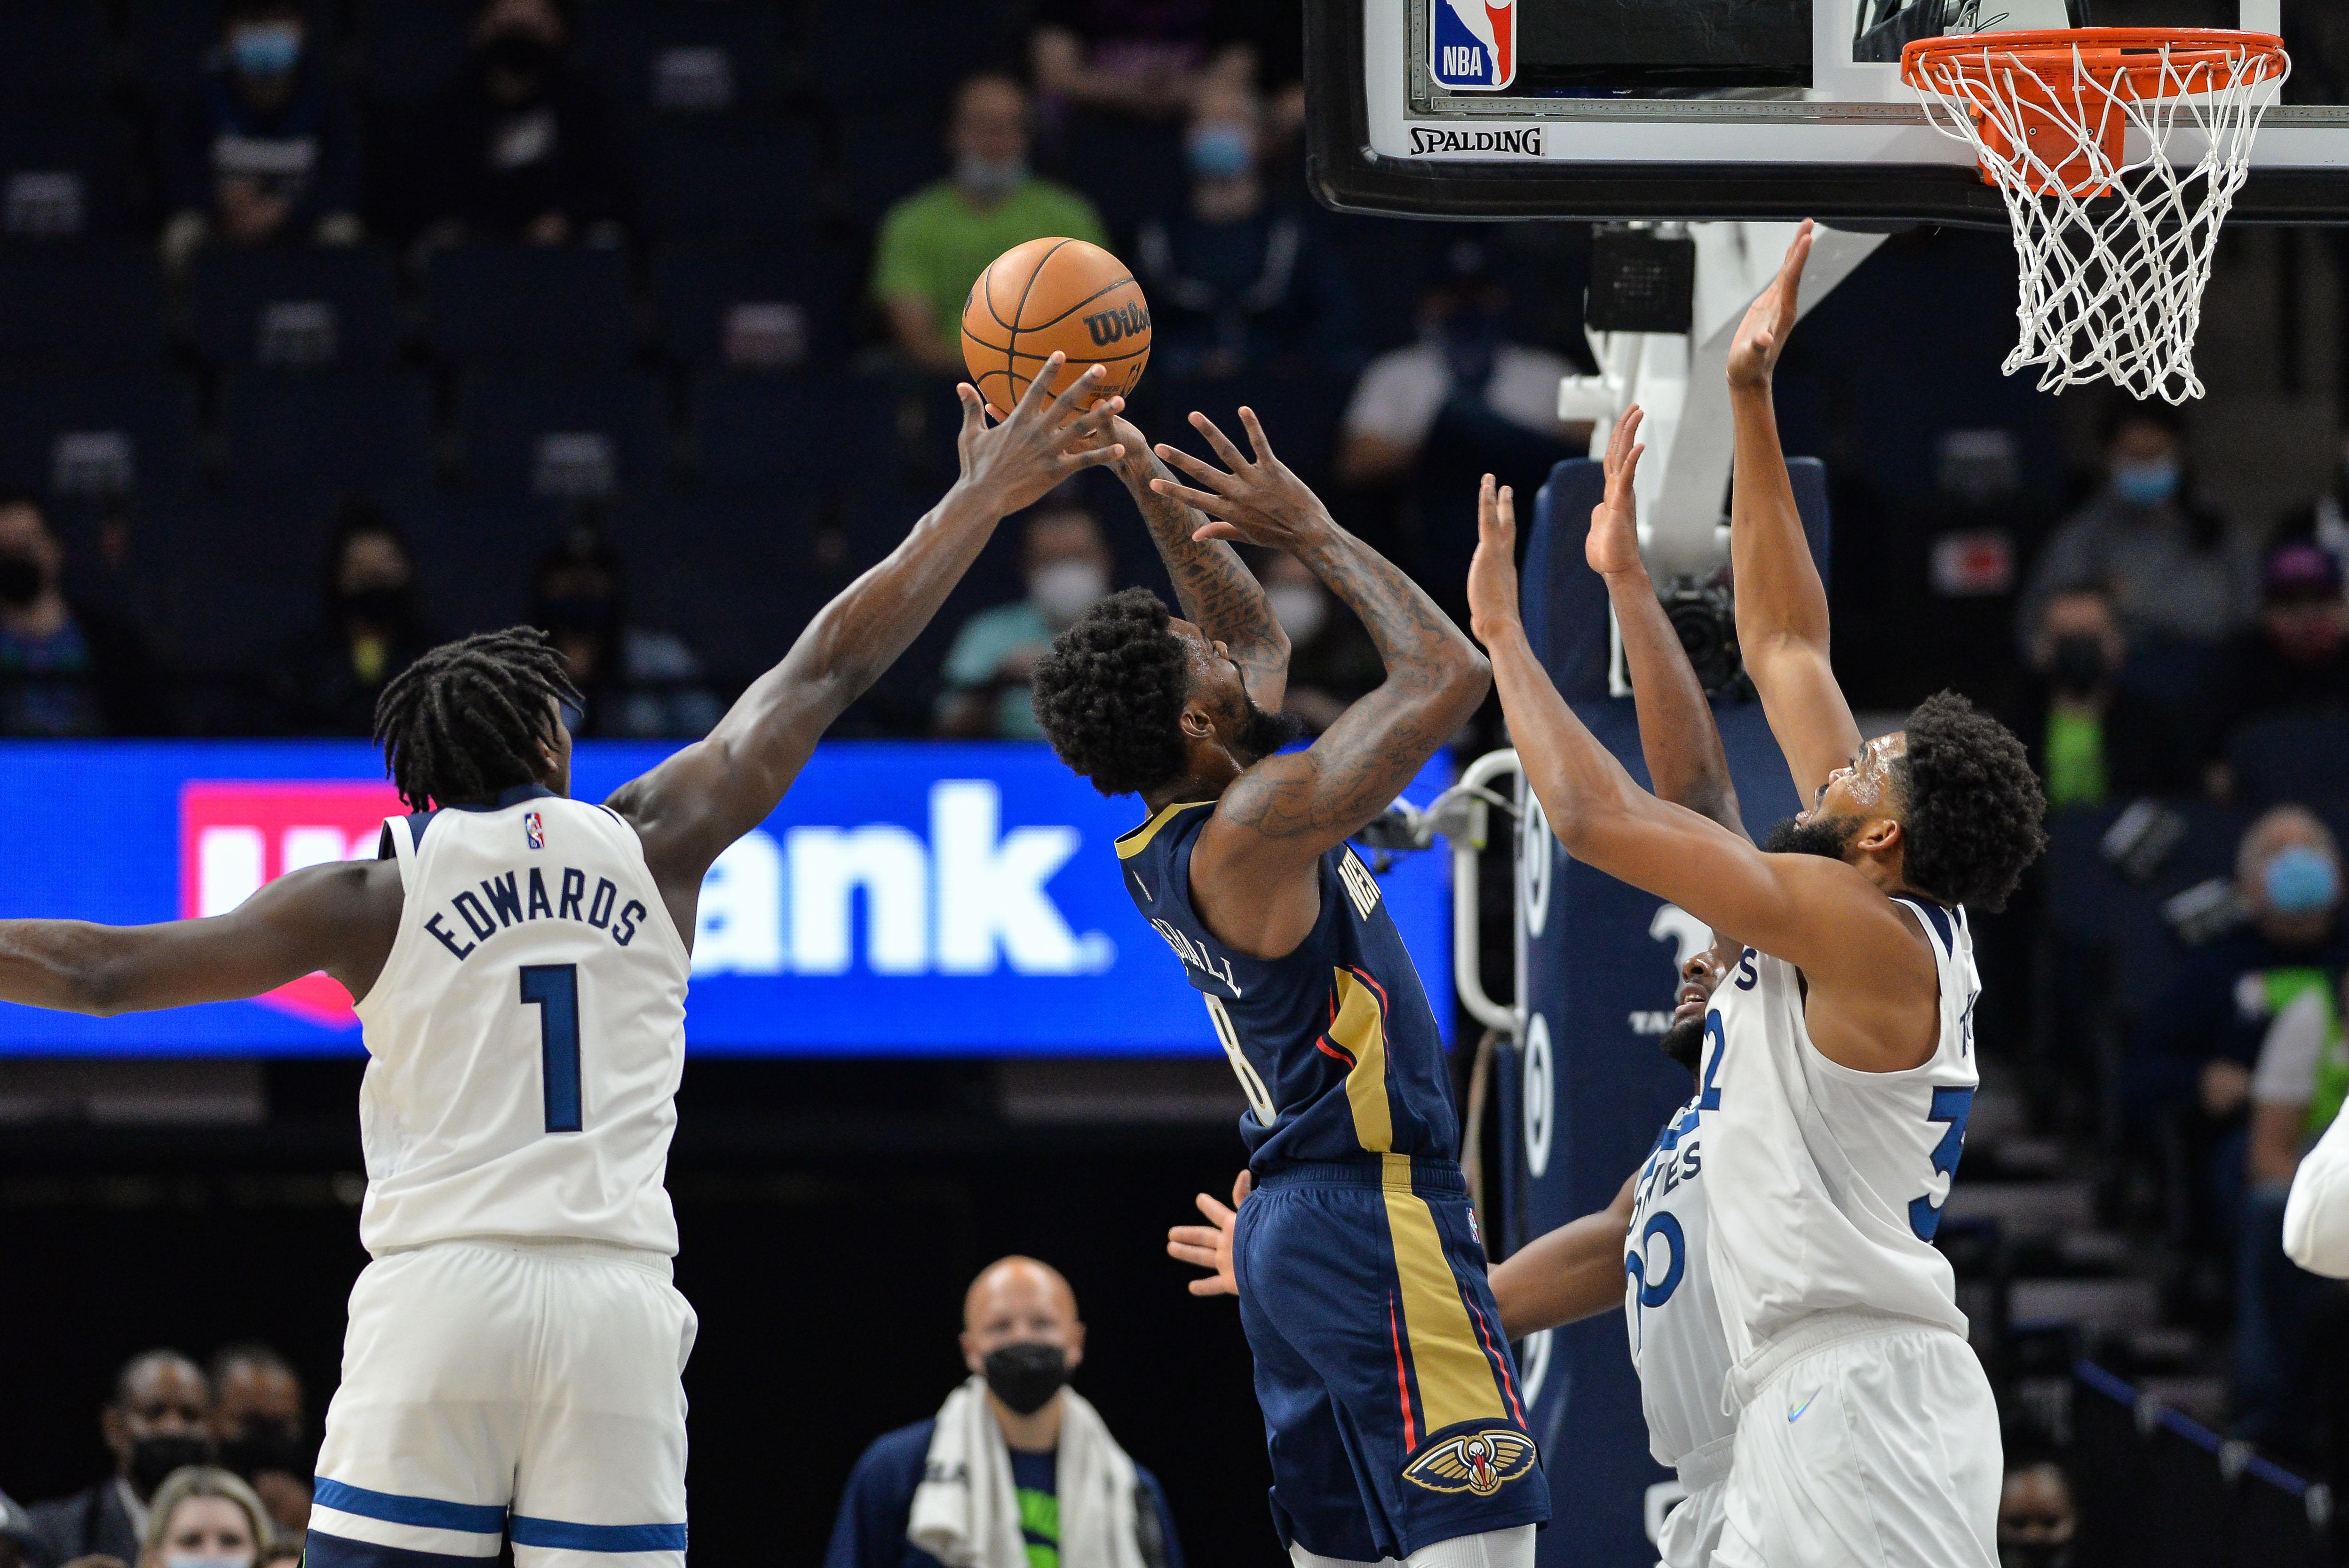 NBA: Preseason-New Orleans Pelicans at Minnesota Timberwolves